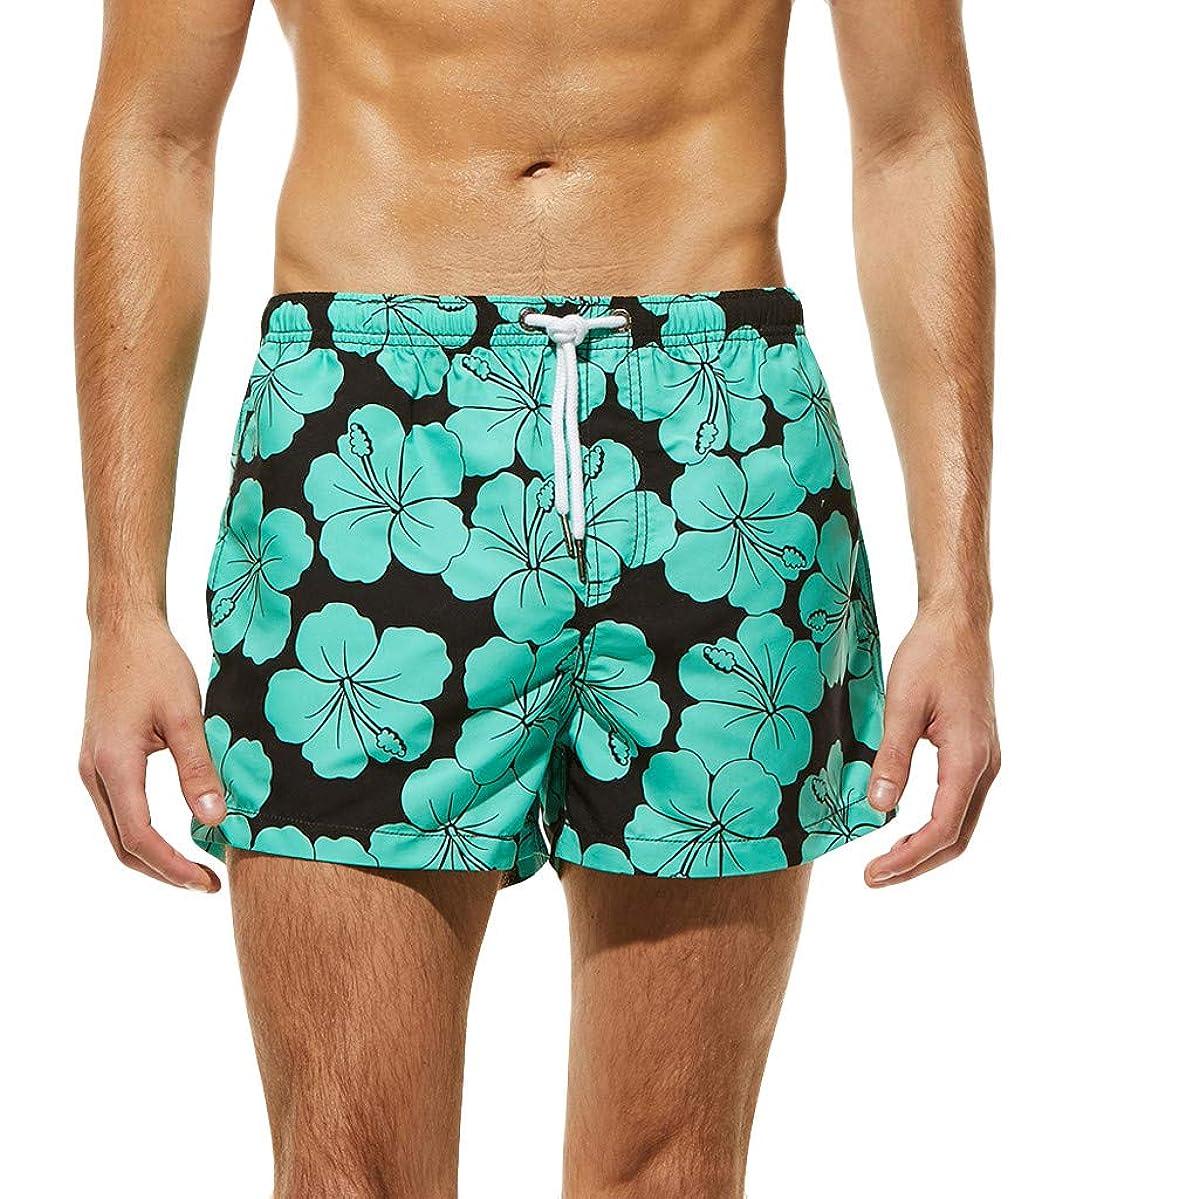 Homlifer Men's Summer Shorts Swim Shorts Leisure Plant Print Short Swim Trunks Quick Drying Beach Shorts Swimwear Beach Shorts Bermuda Pocket Drawstring Shorts S-XL